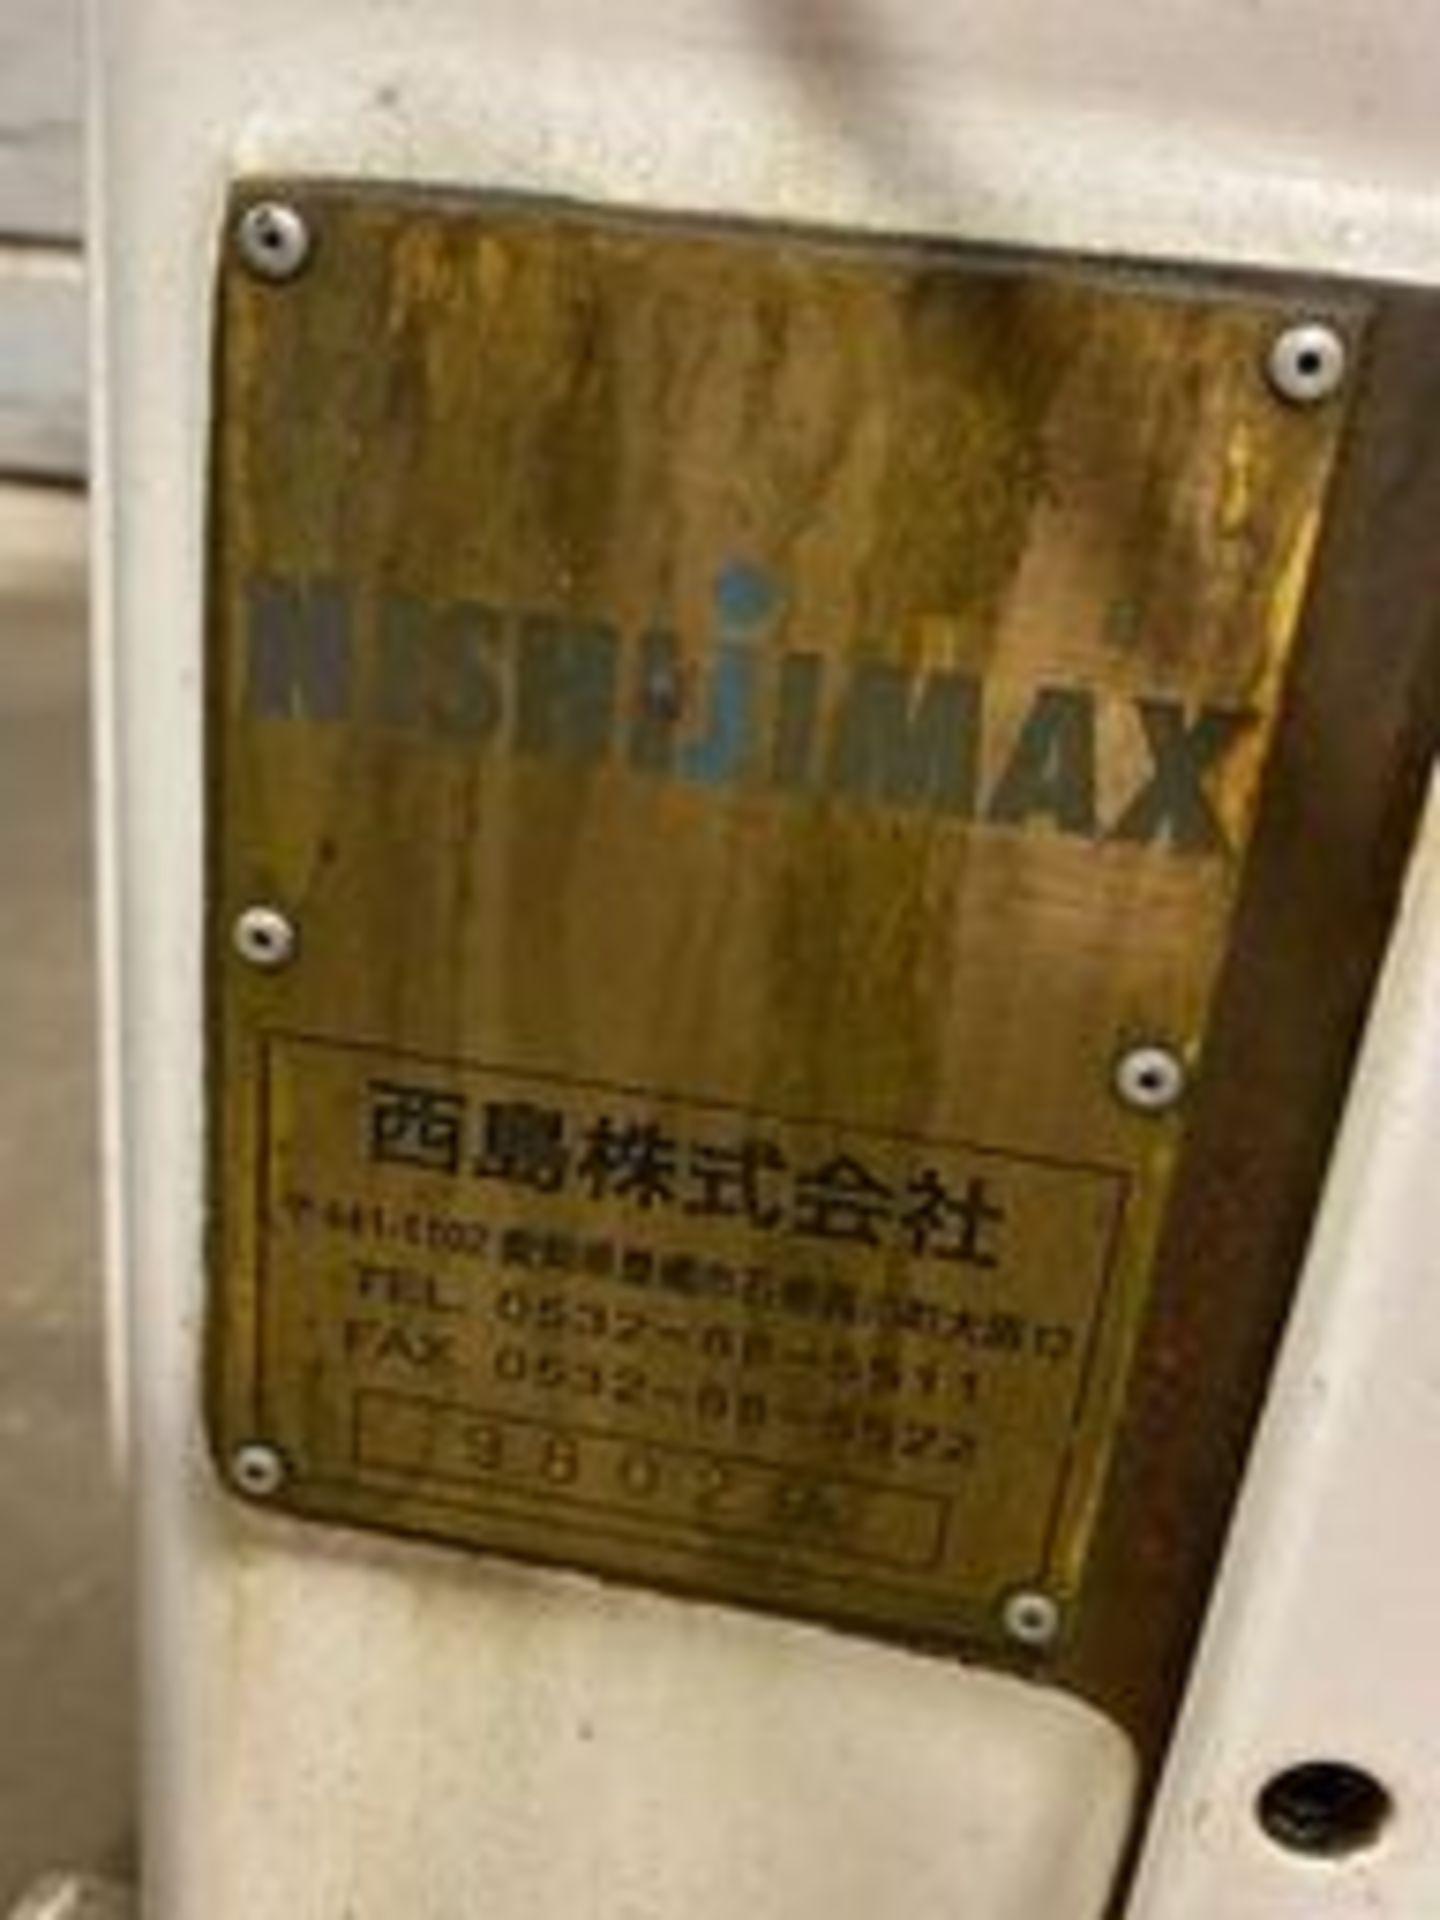 Nishijimax CNC Grinder, S/N #98029 (Comes W/ MDSI CNC Controller) - Image 5 of 5